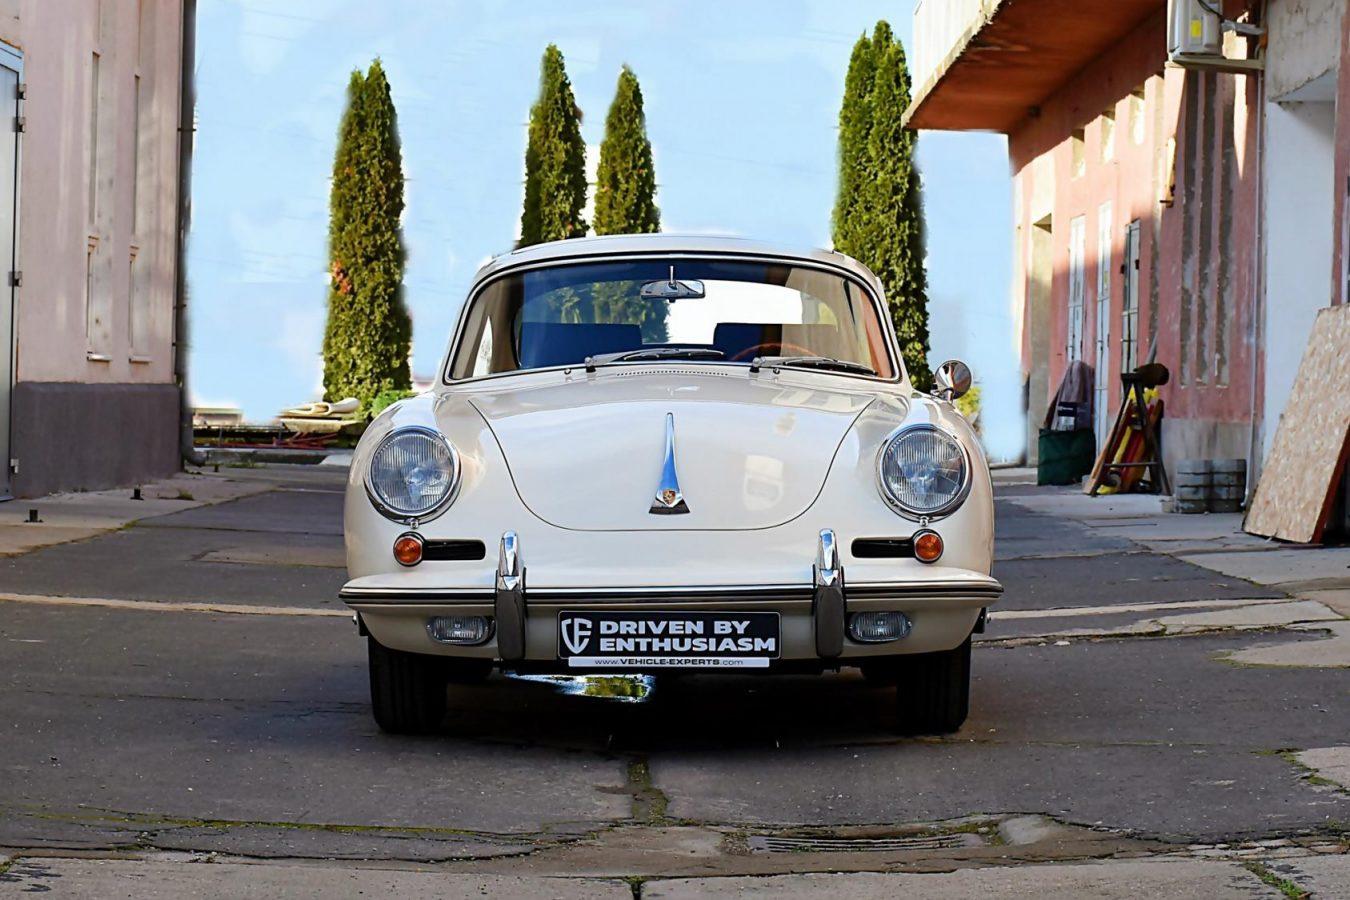 Porsche 356 C 2000 GS Carrera 2 Coupè 48